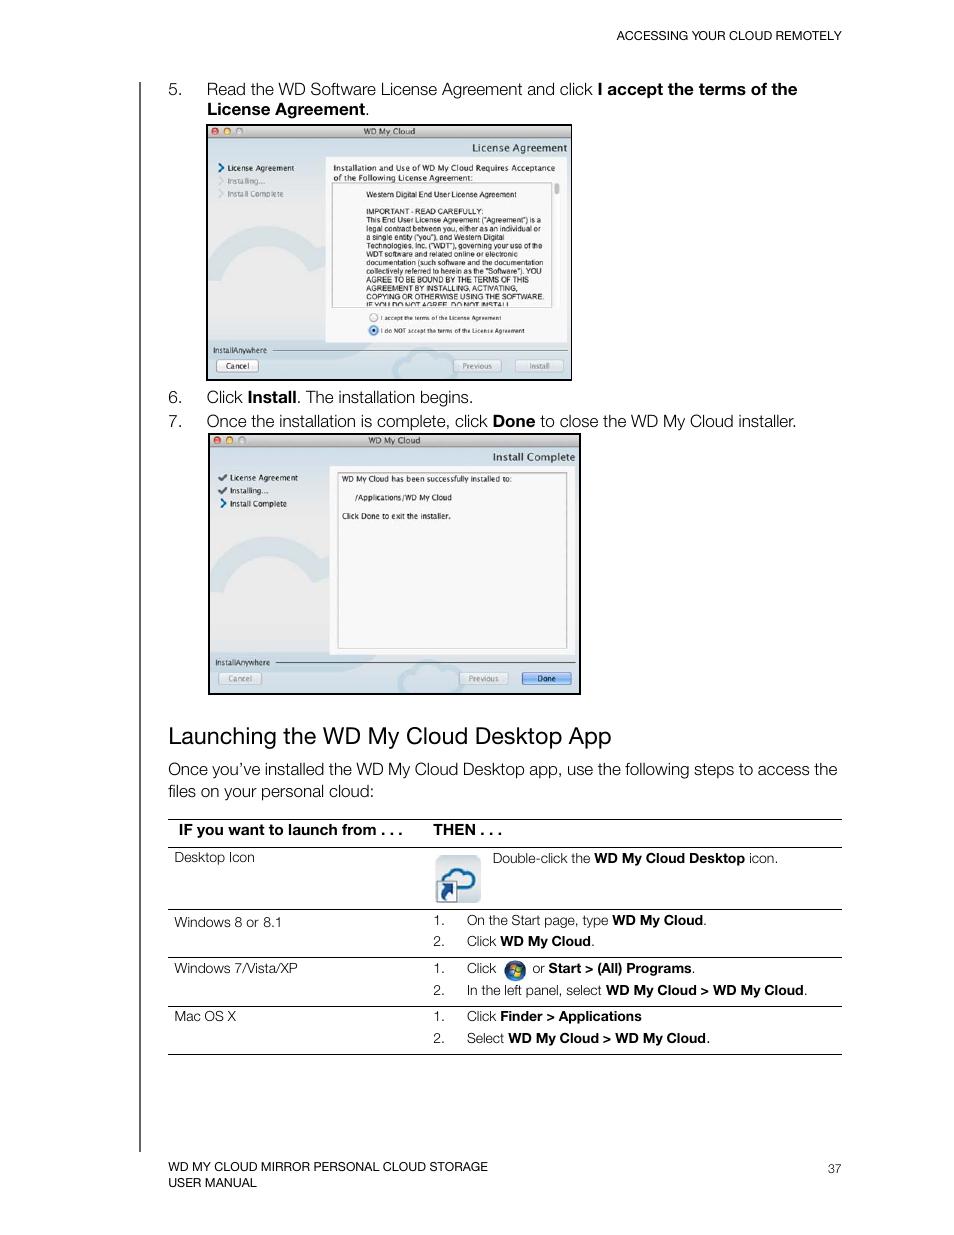 Launching the wd my cloud desktop app | Western Digital My Cloud